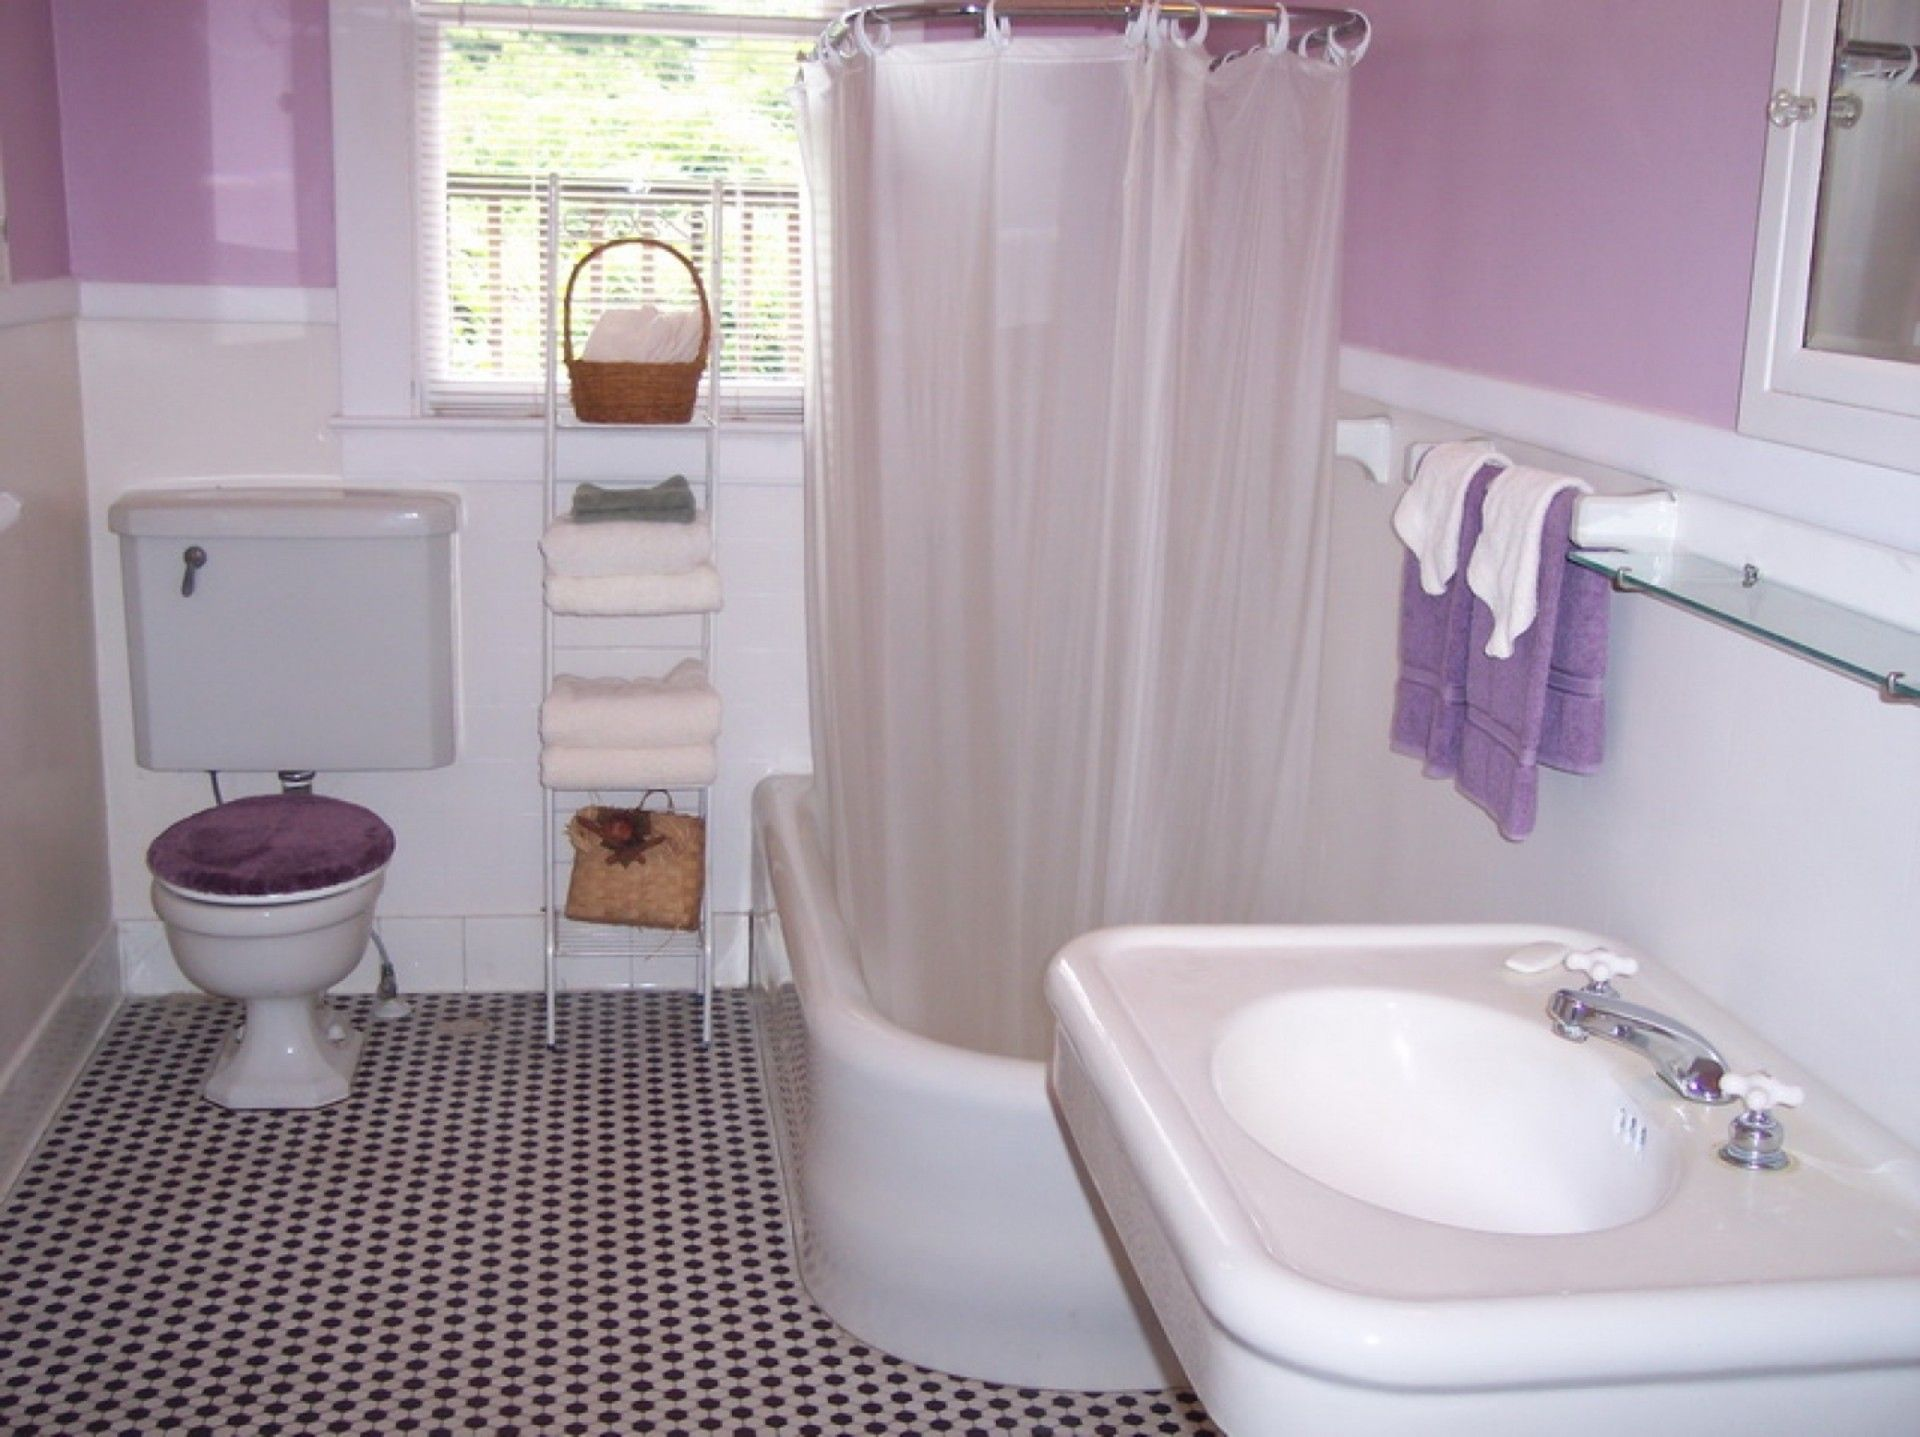 How to Refinish a Fiberglass Bathtub   Hot Tubs & Jacuzzis   Pinterest